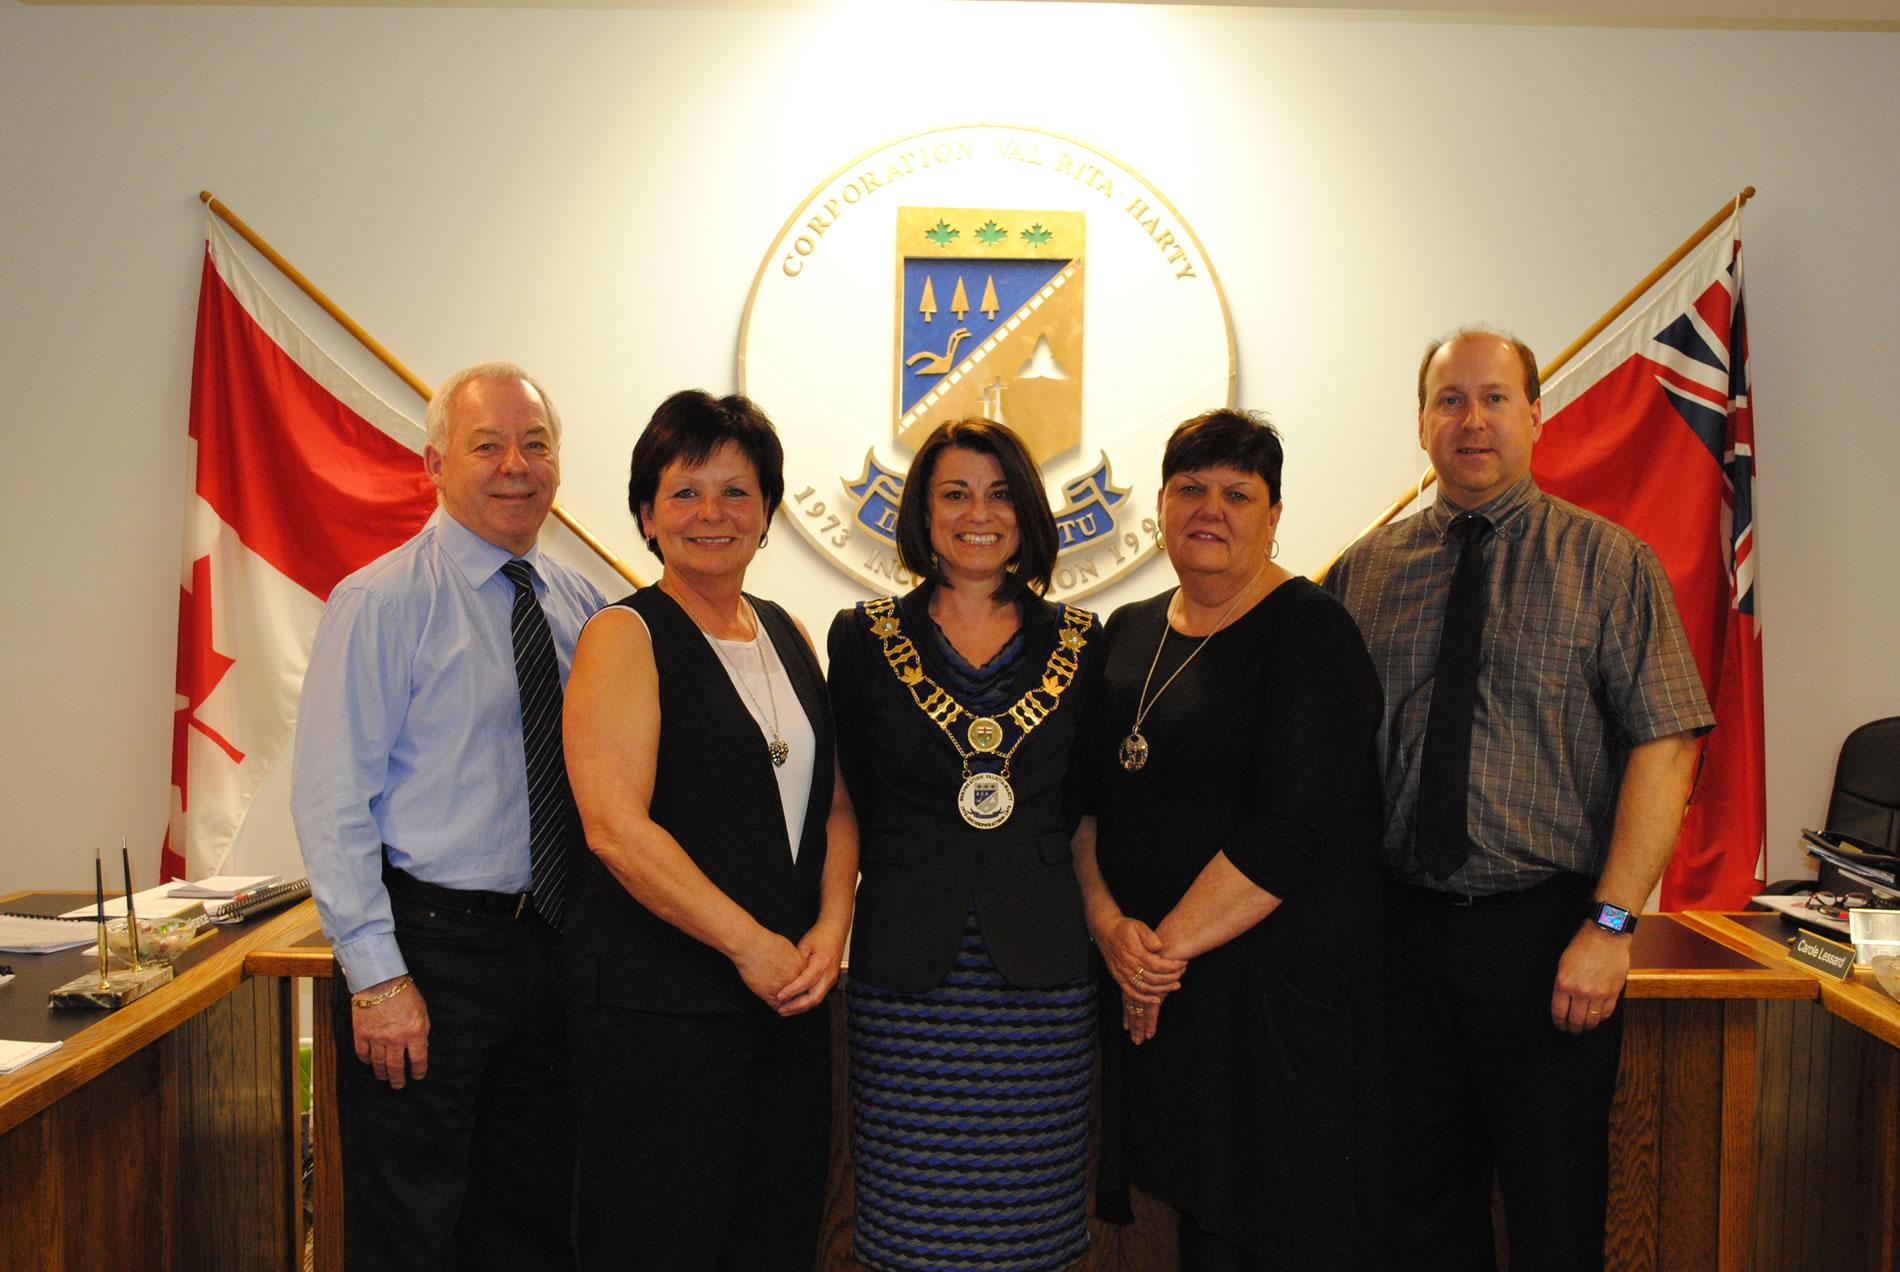 De gauche à droite : Roger Lachance, conseiller, Angèle Beauvais, conseillère, Johanne Baril, mairesse, Carole Lessard, conseillère, Alain Tremblay, conseiller